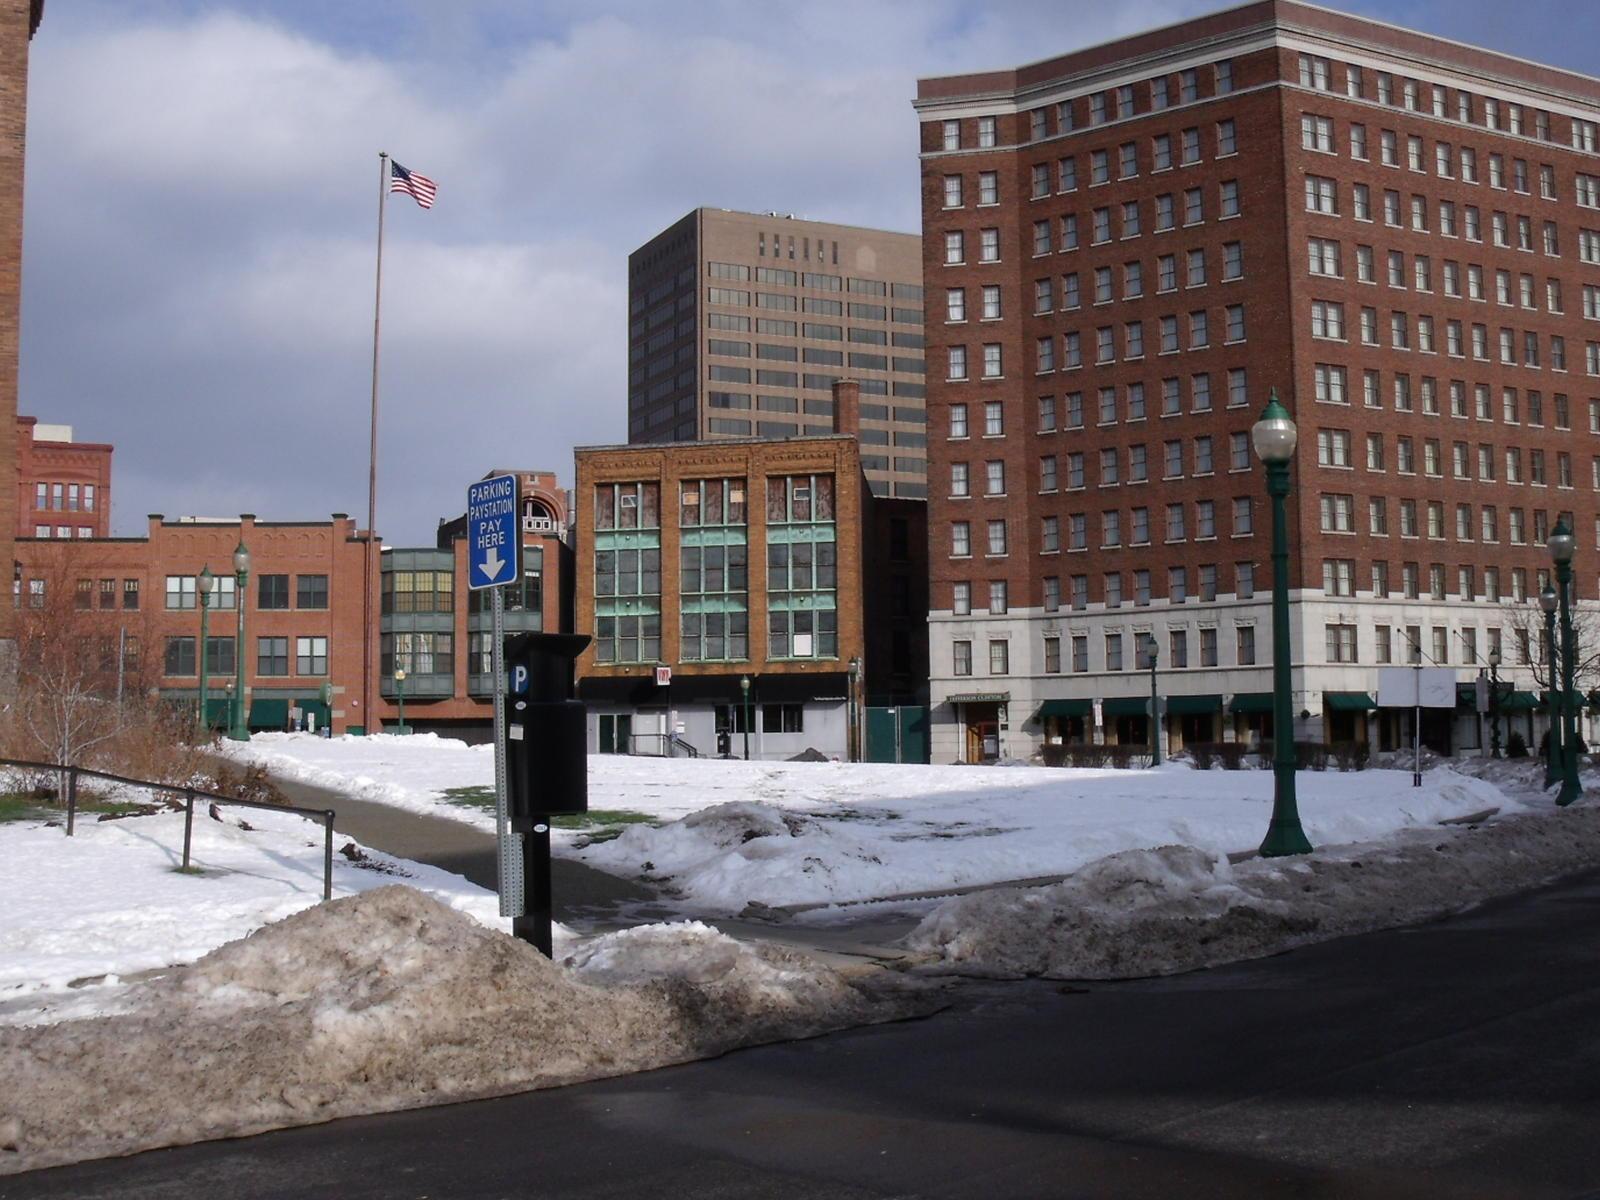 My Pictures Of Downtown Syracuse Ny Buffalo Huntington